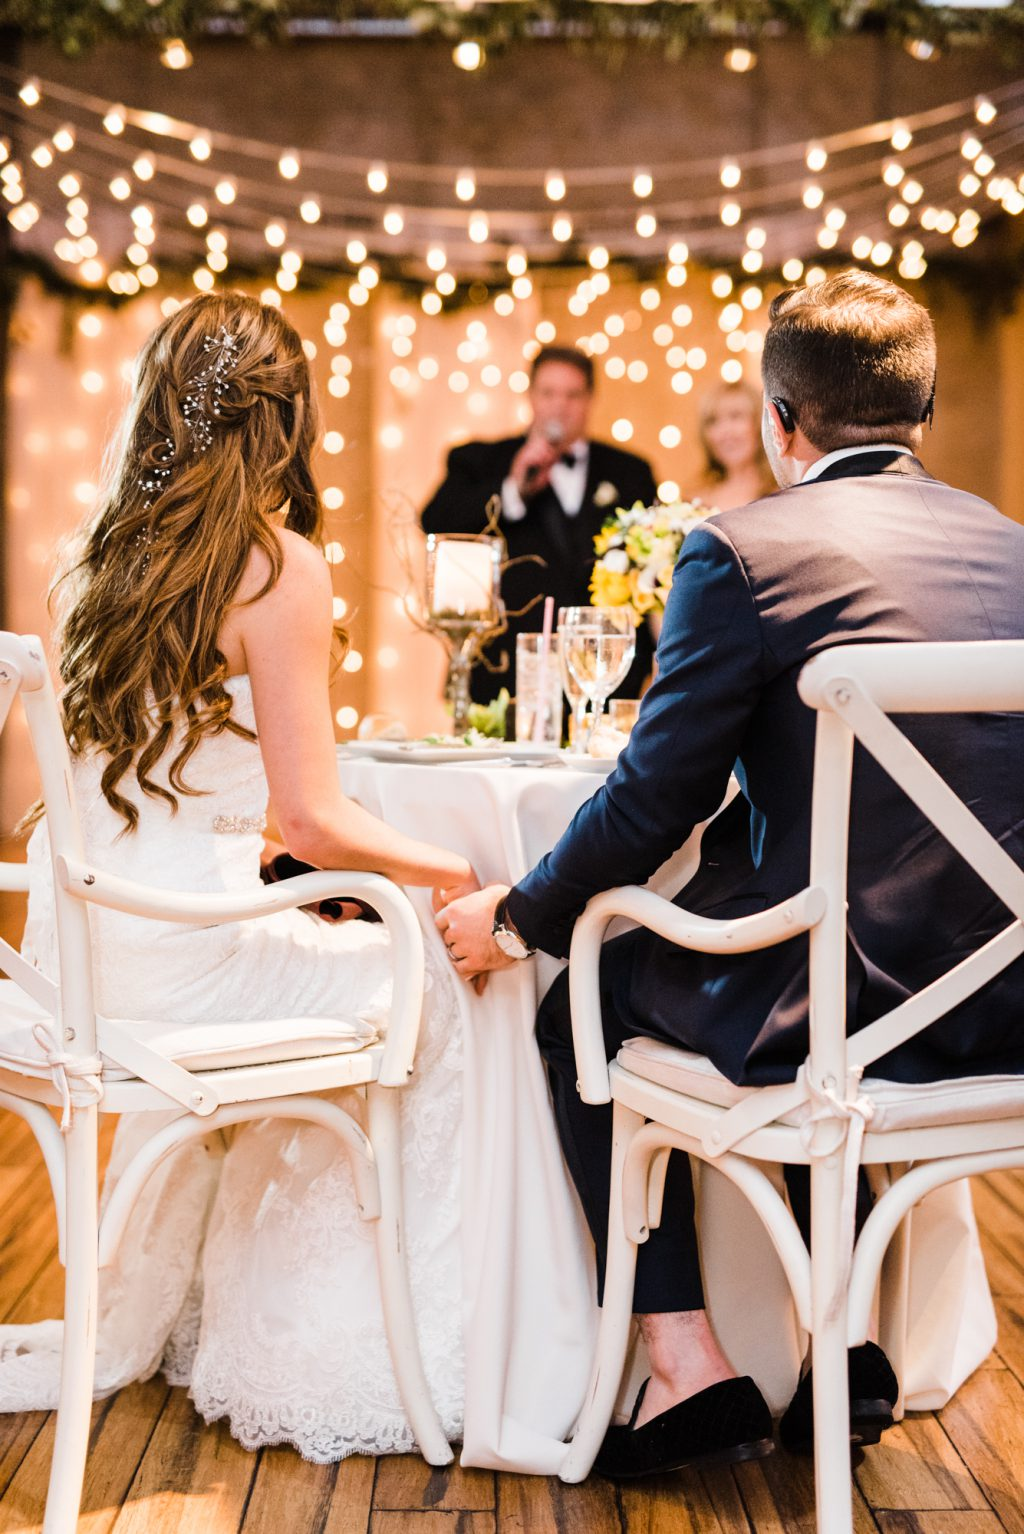 haleyrichterphoto-front-and-palmer-spring-wedding-rodin-museum-loews-hotel-philadelphia-172